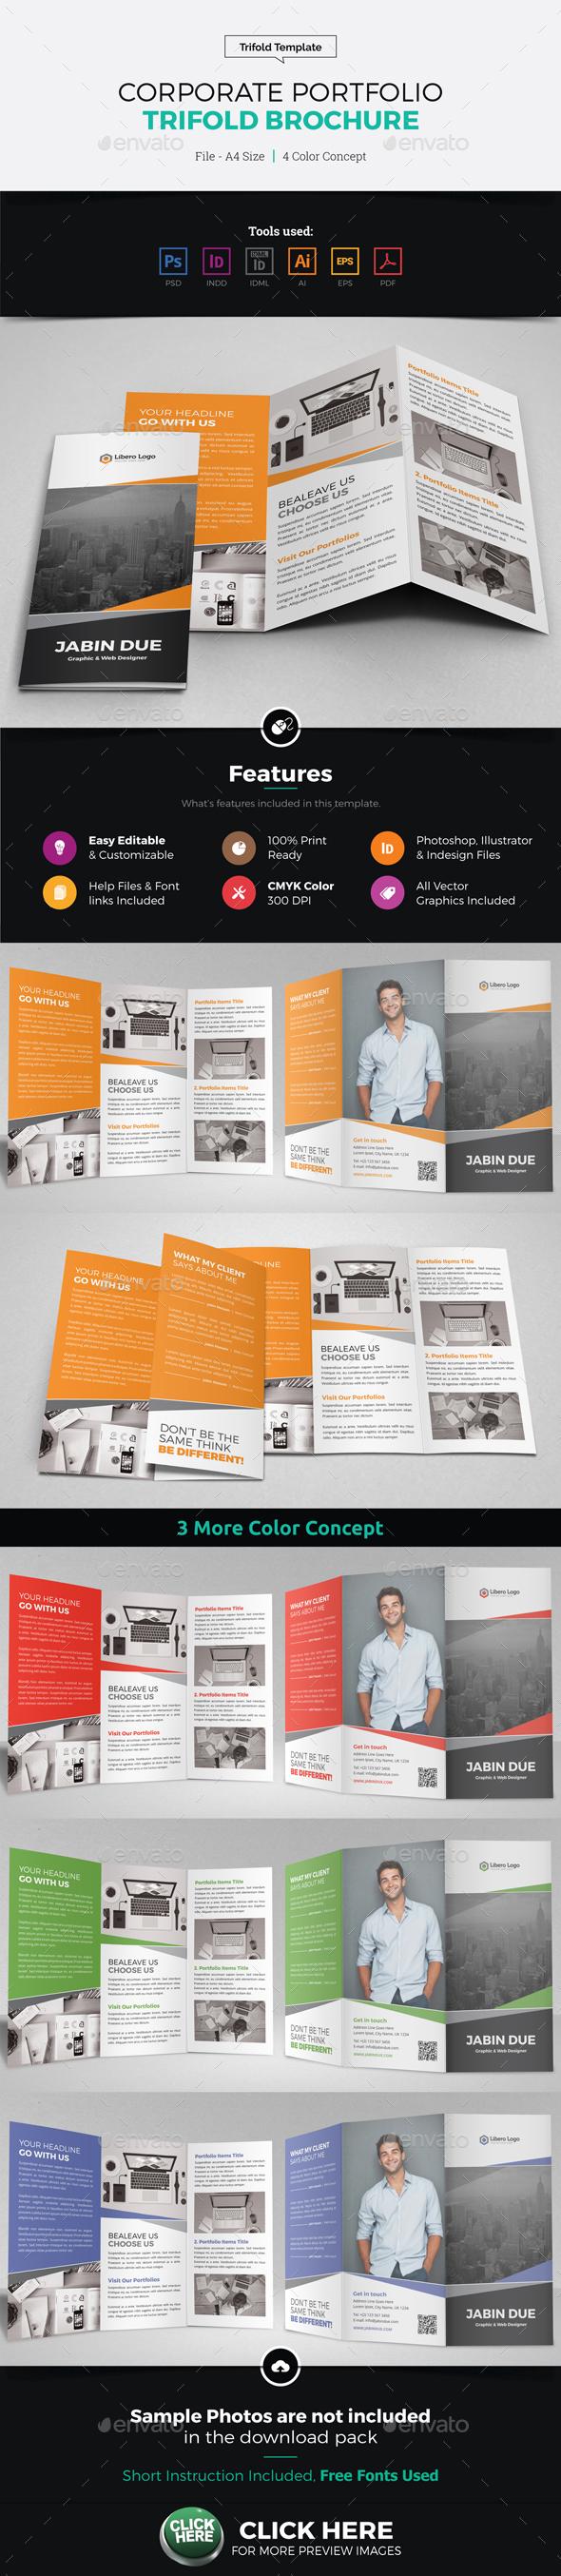 Portfolio Trifold Brochure Design - Corporate Brochures